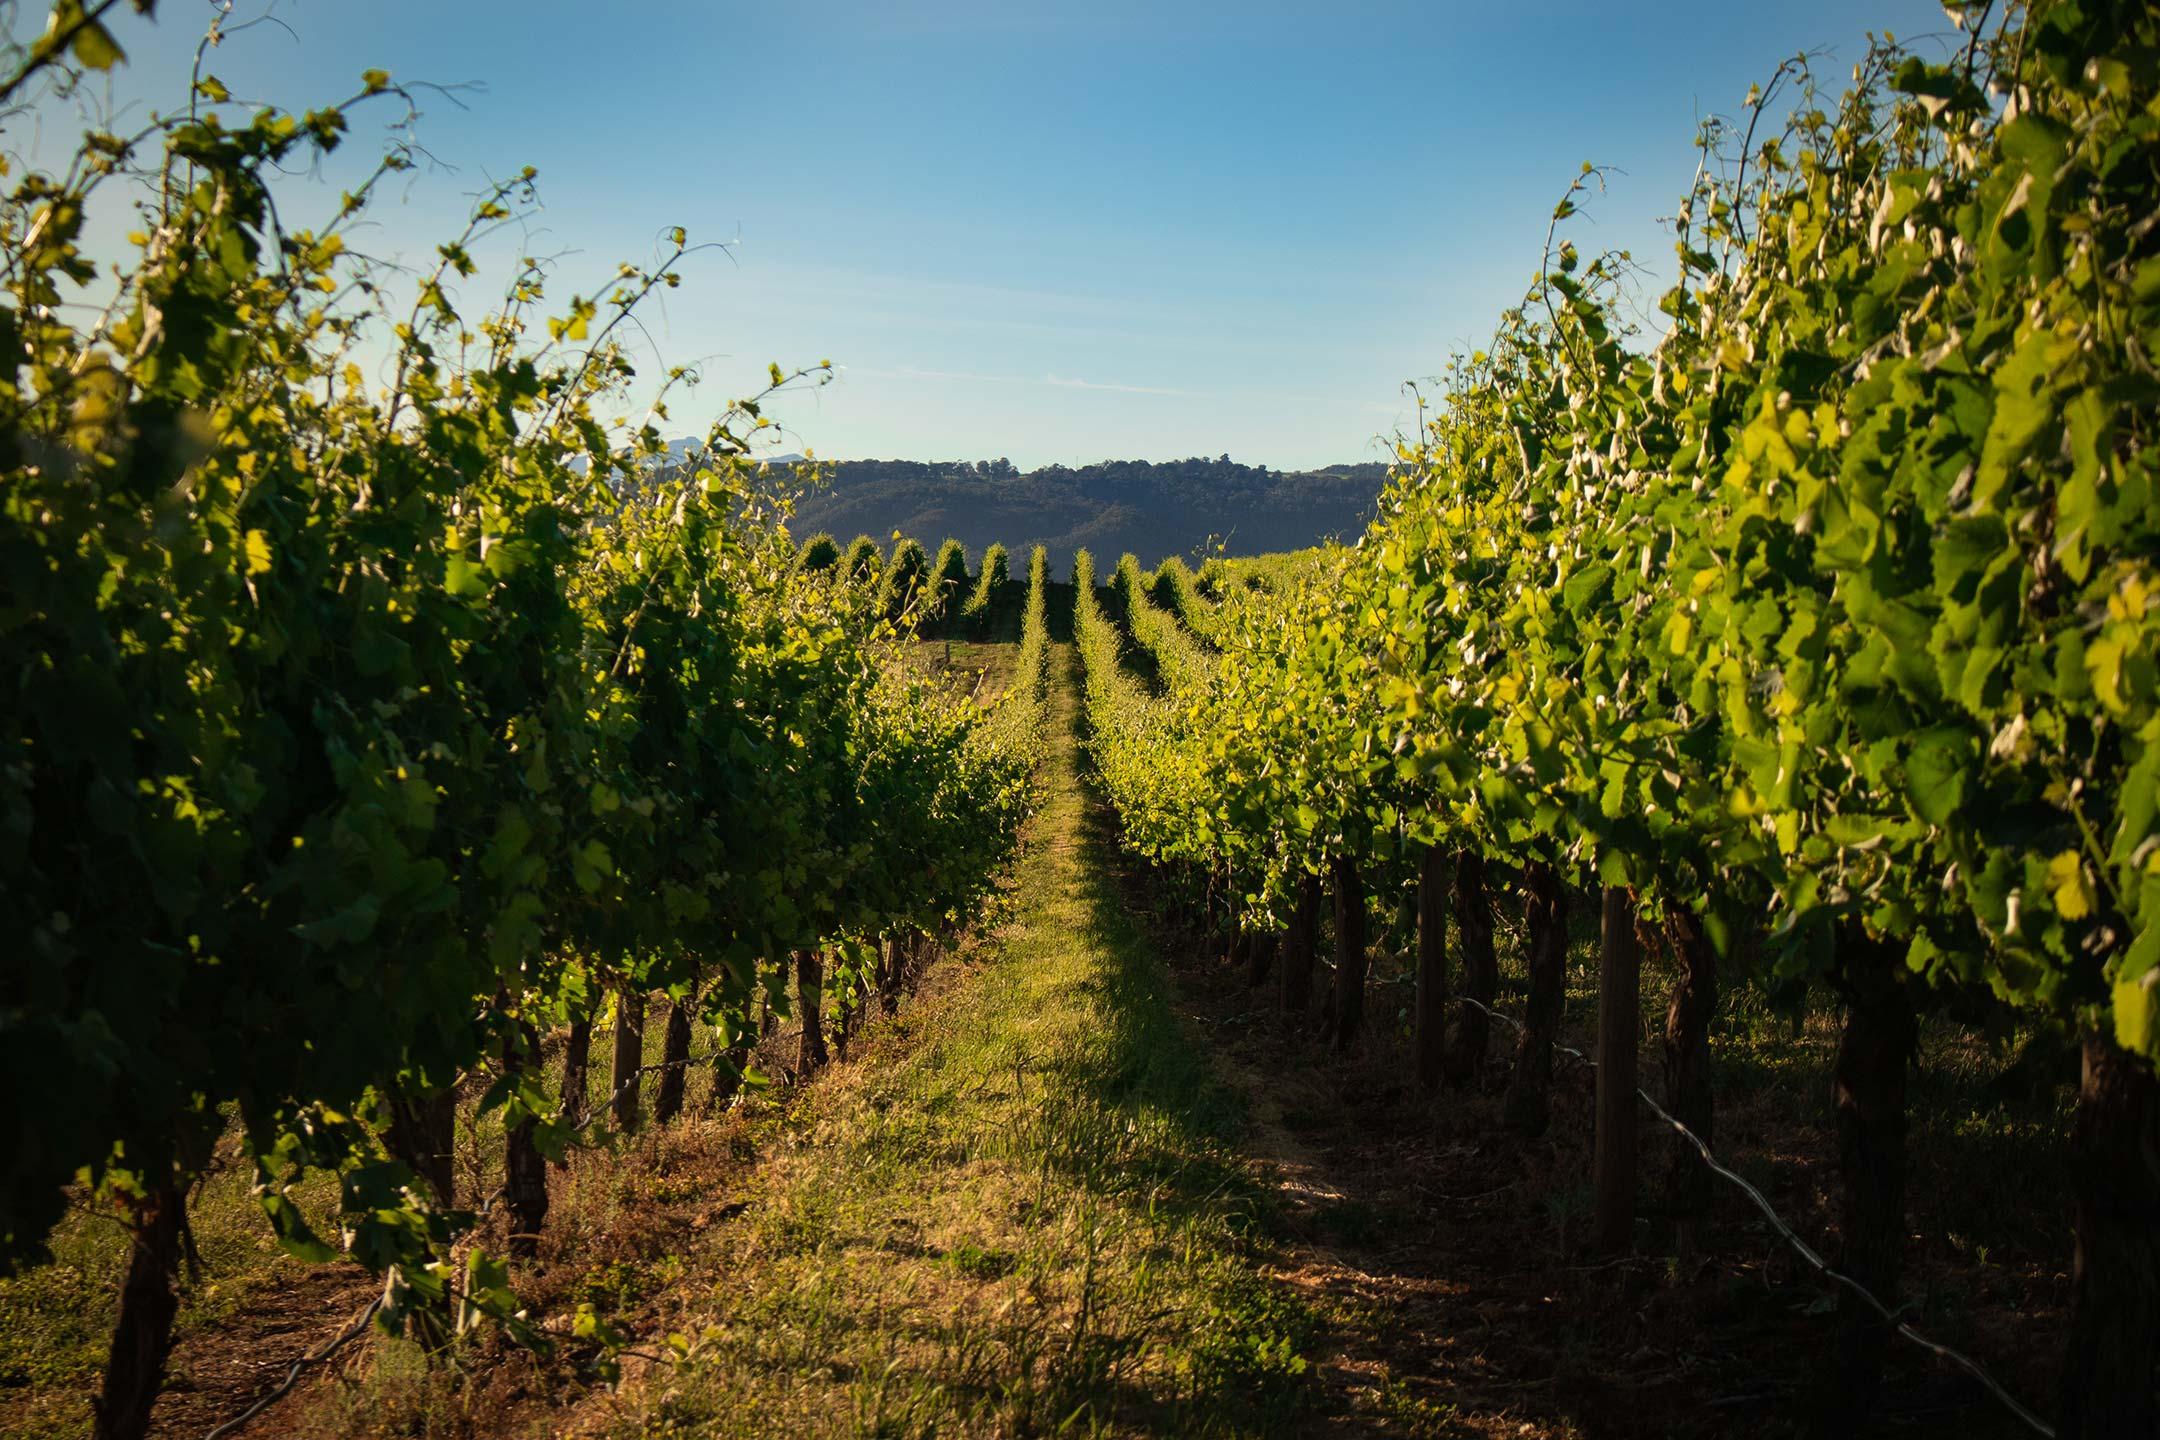 Walking through the grown vineyards in summer.